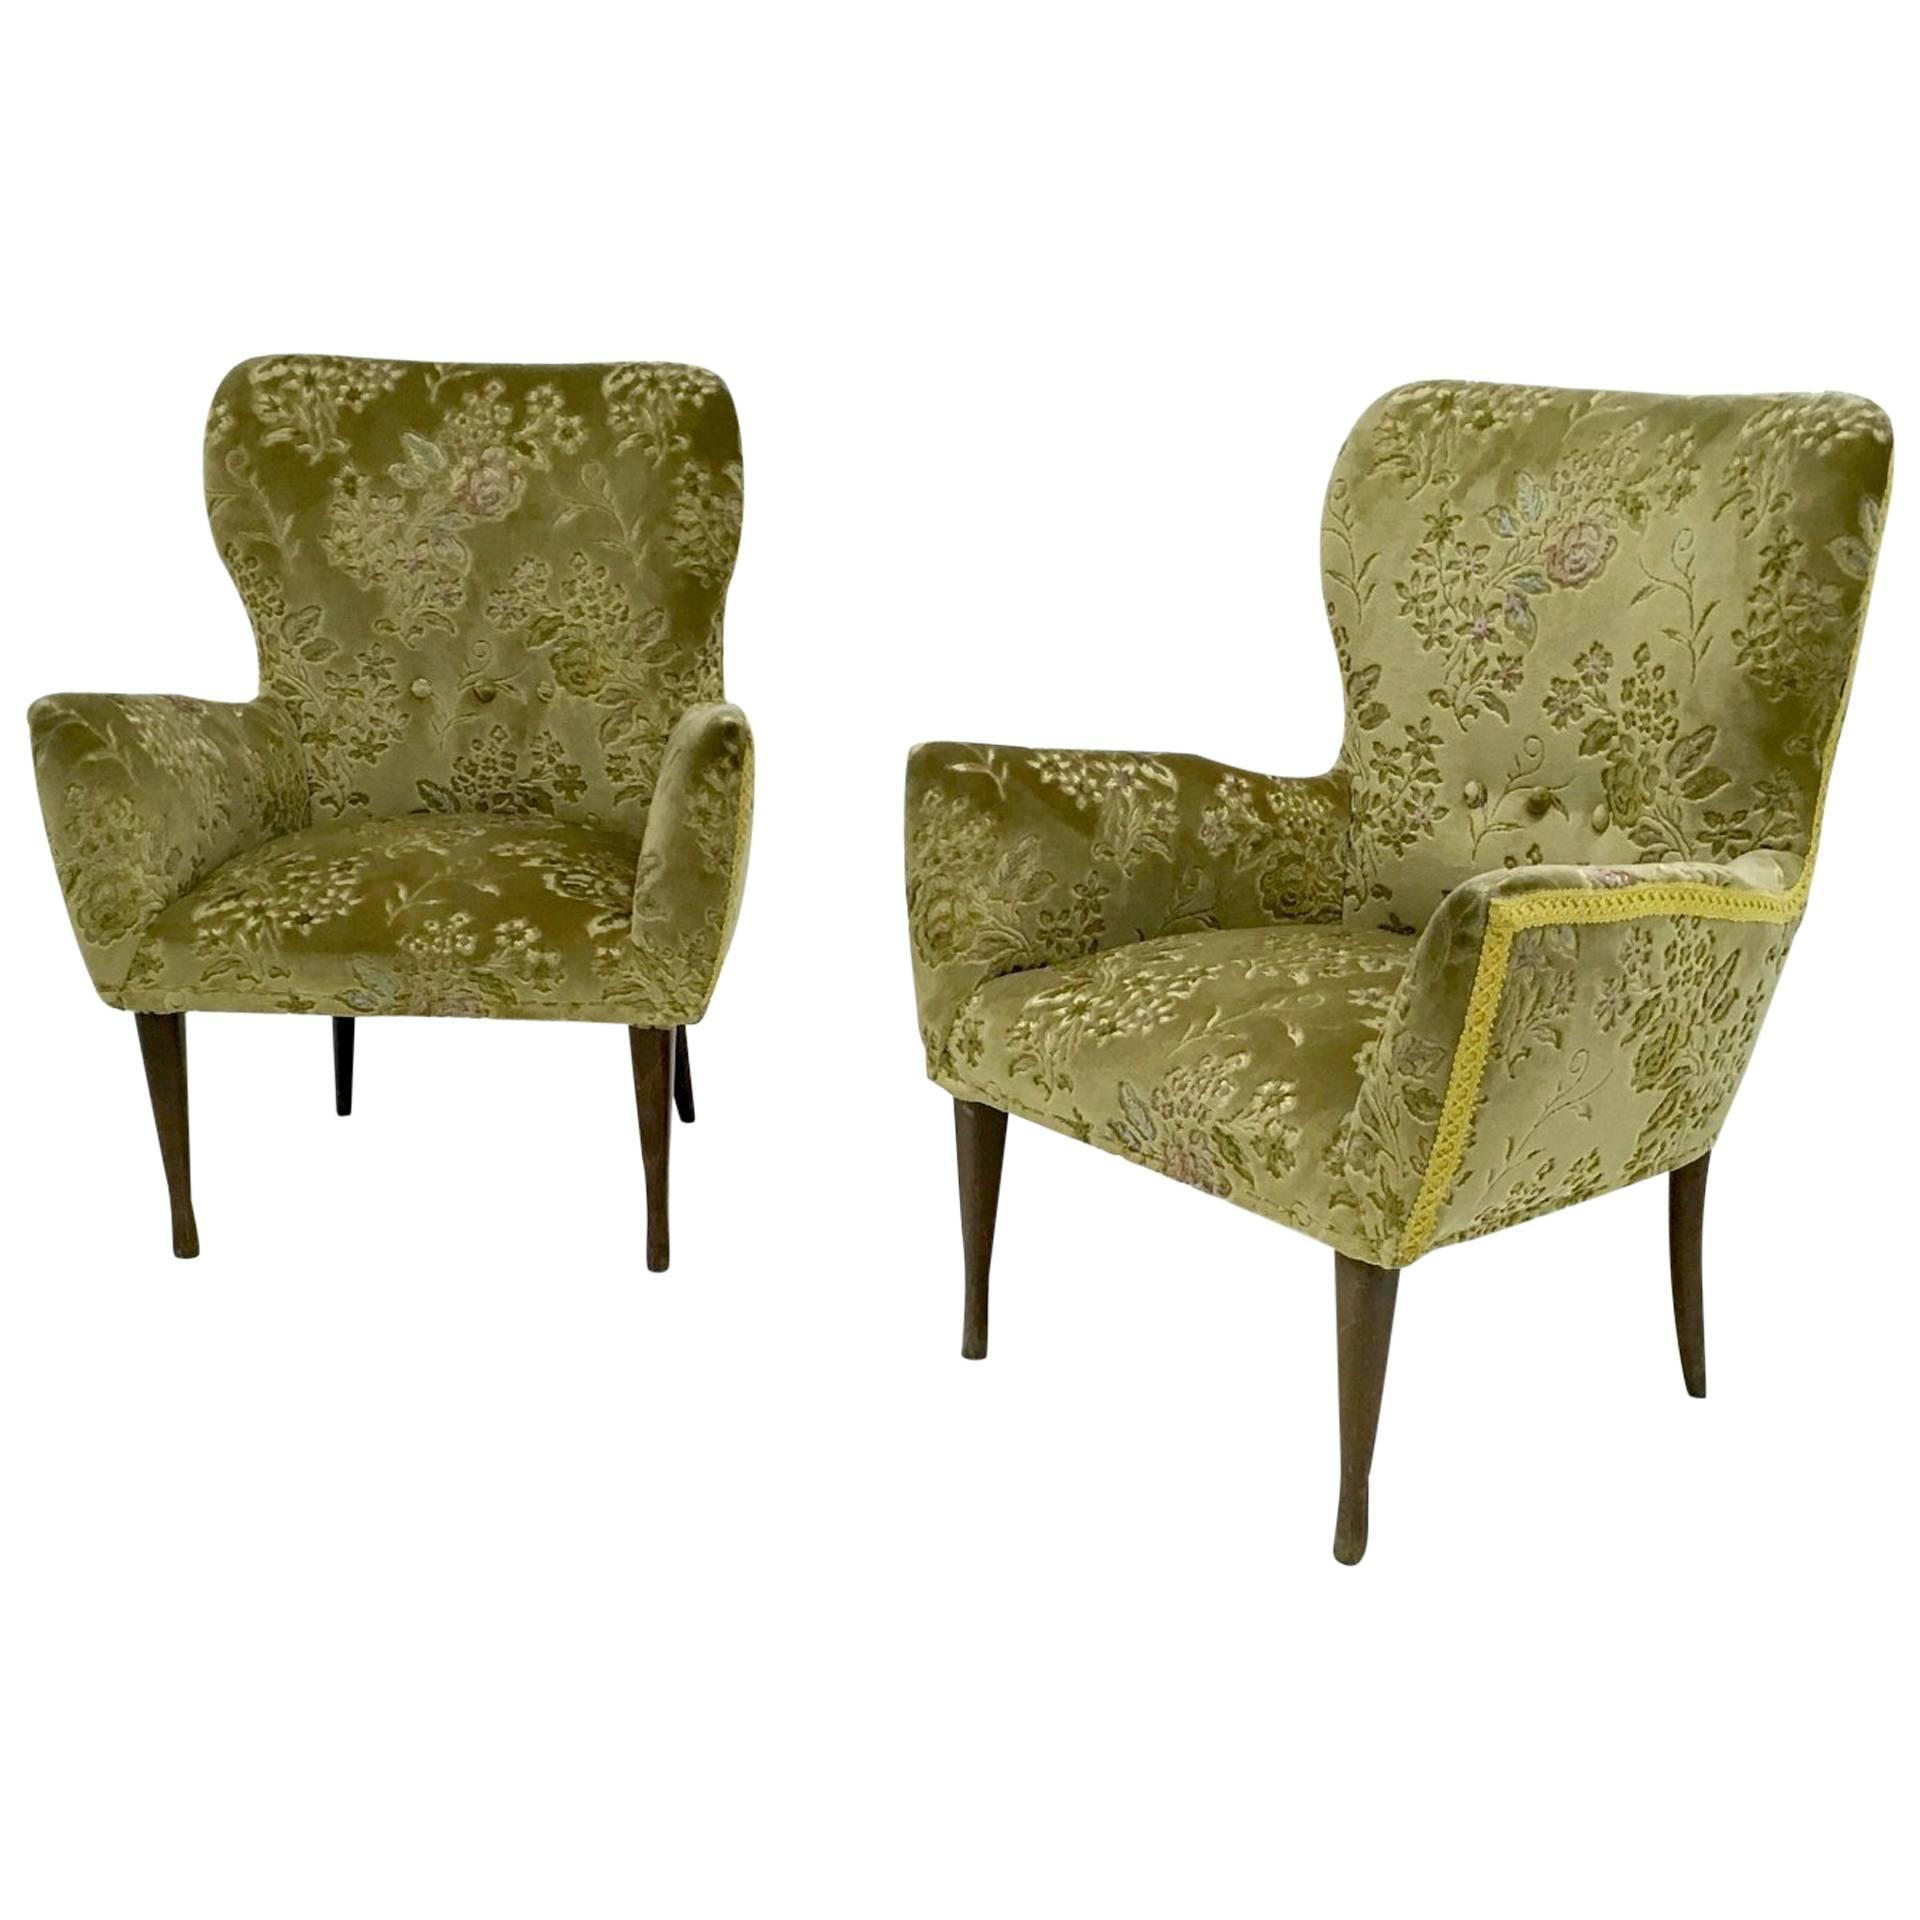 Pair of Vintage Velvet Armchairs, Italy, 1950s